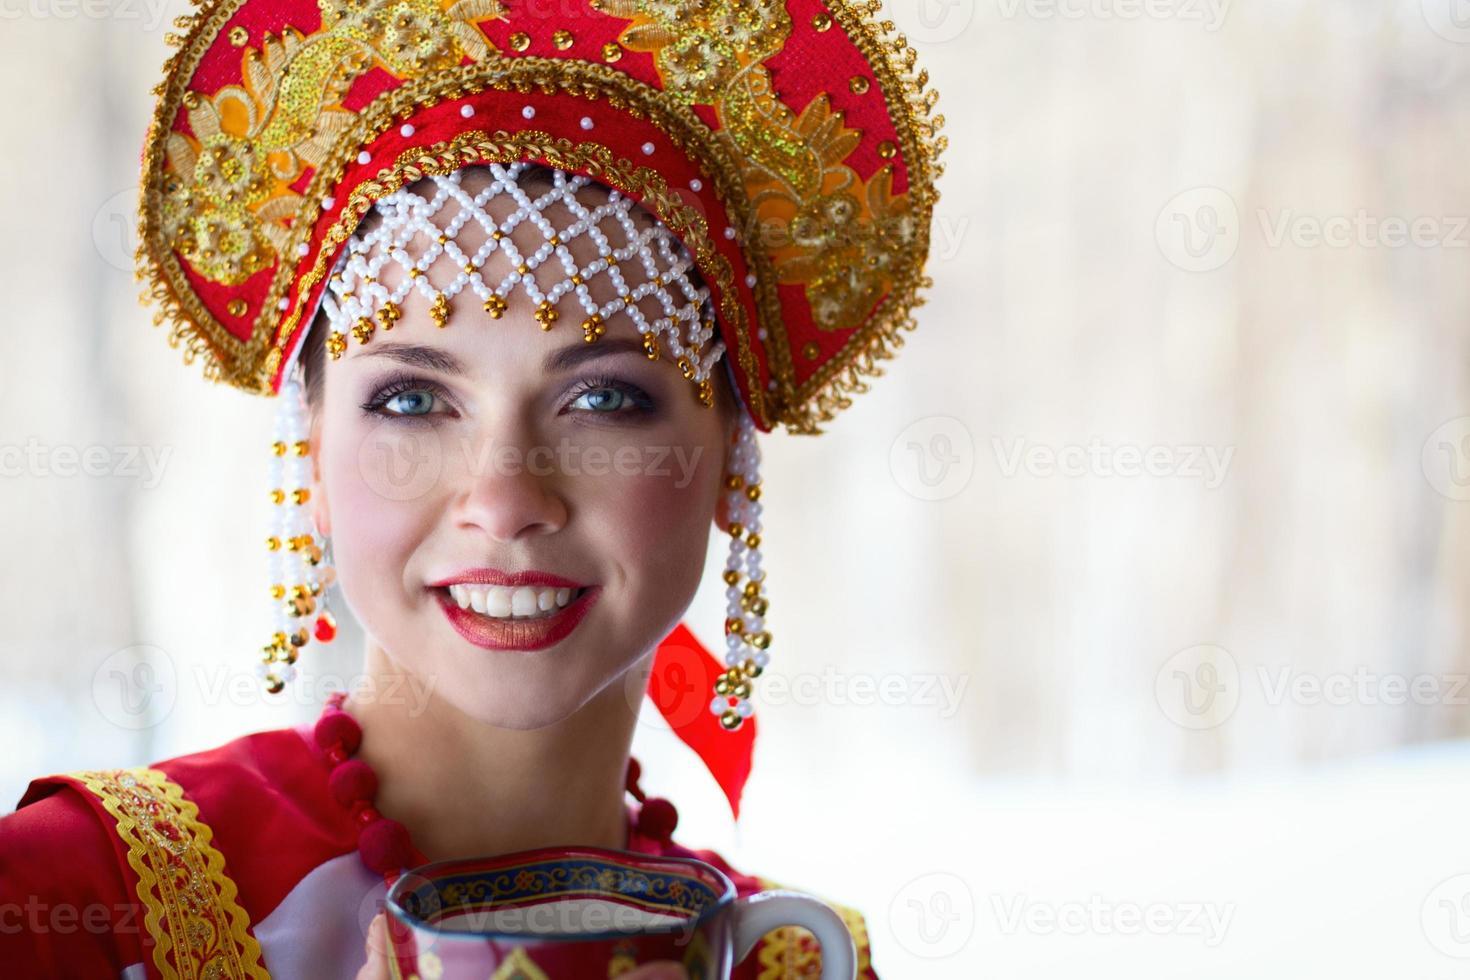 fille russe dans un kokoshnik photo